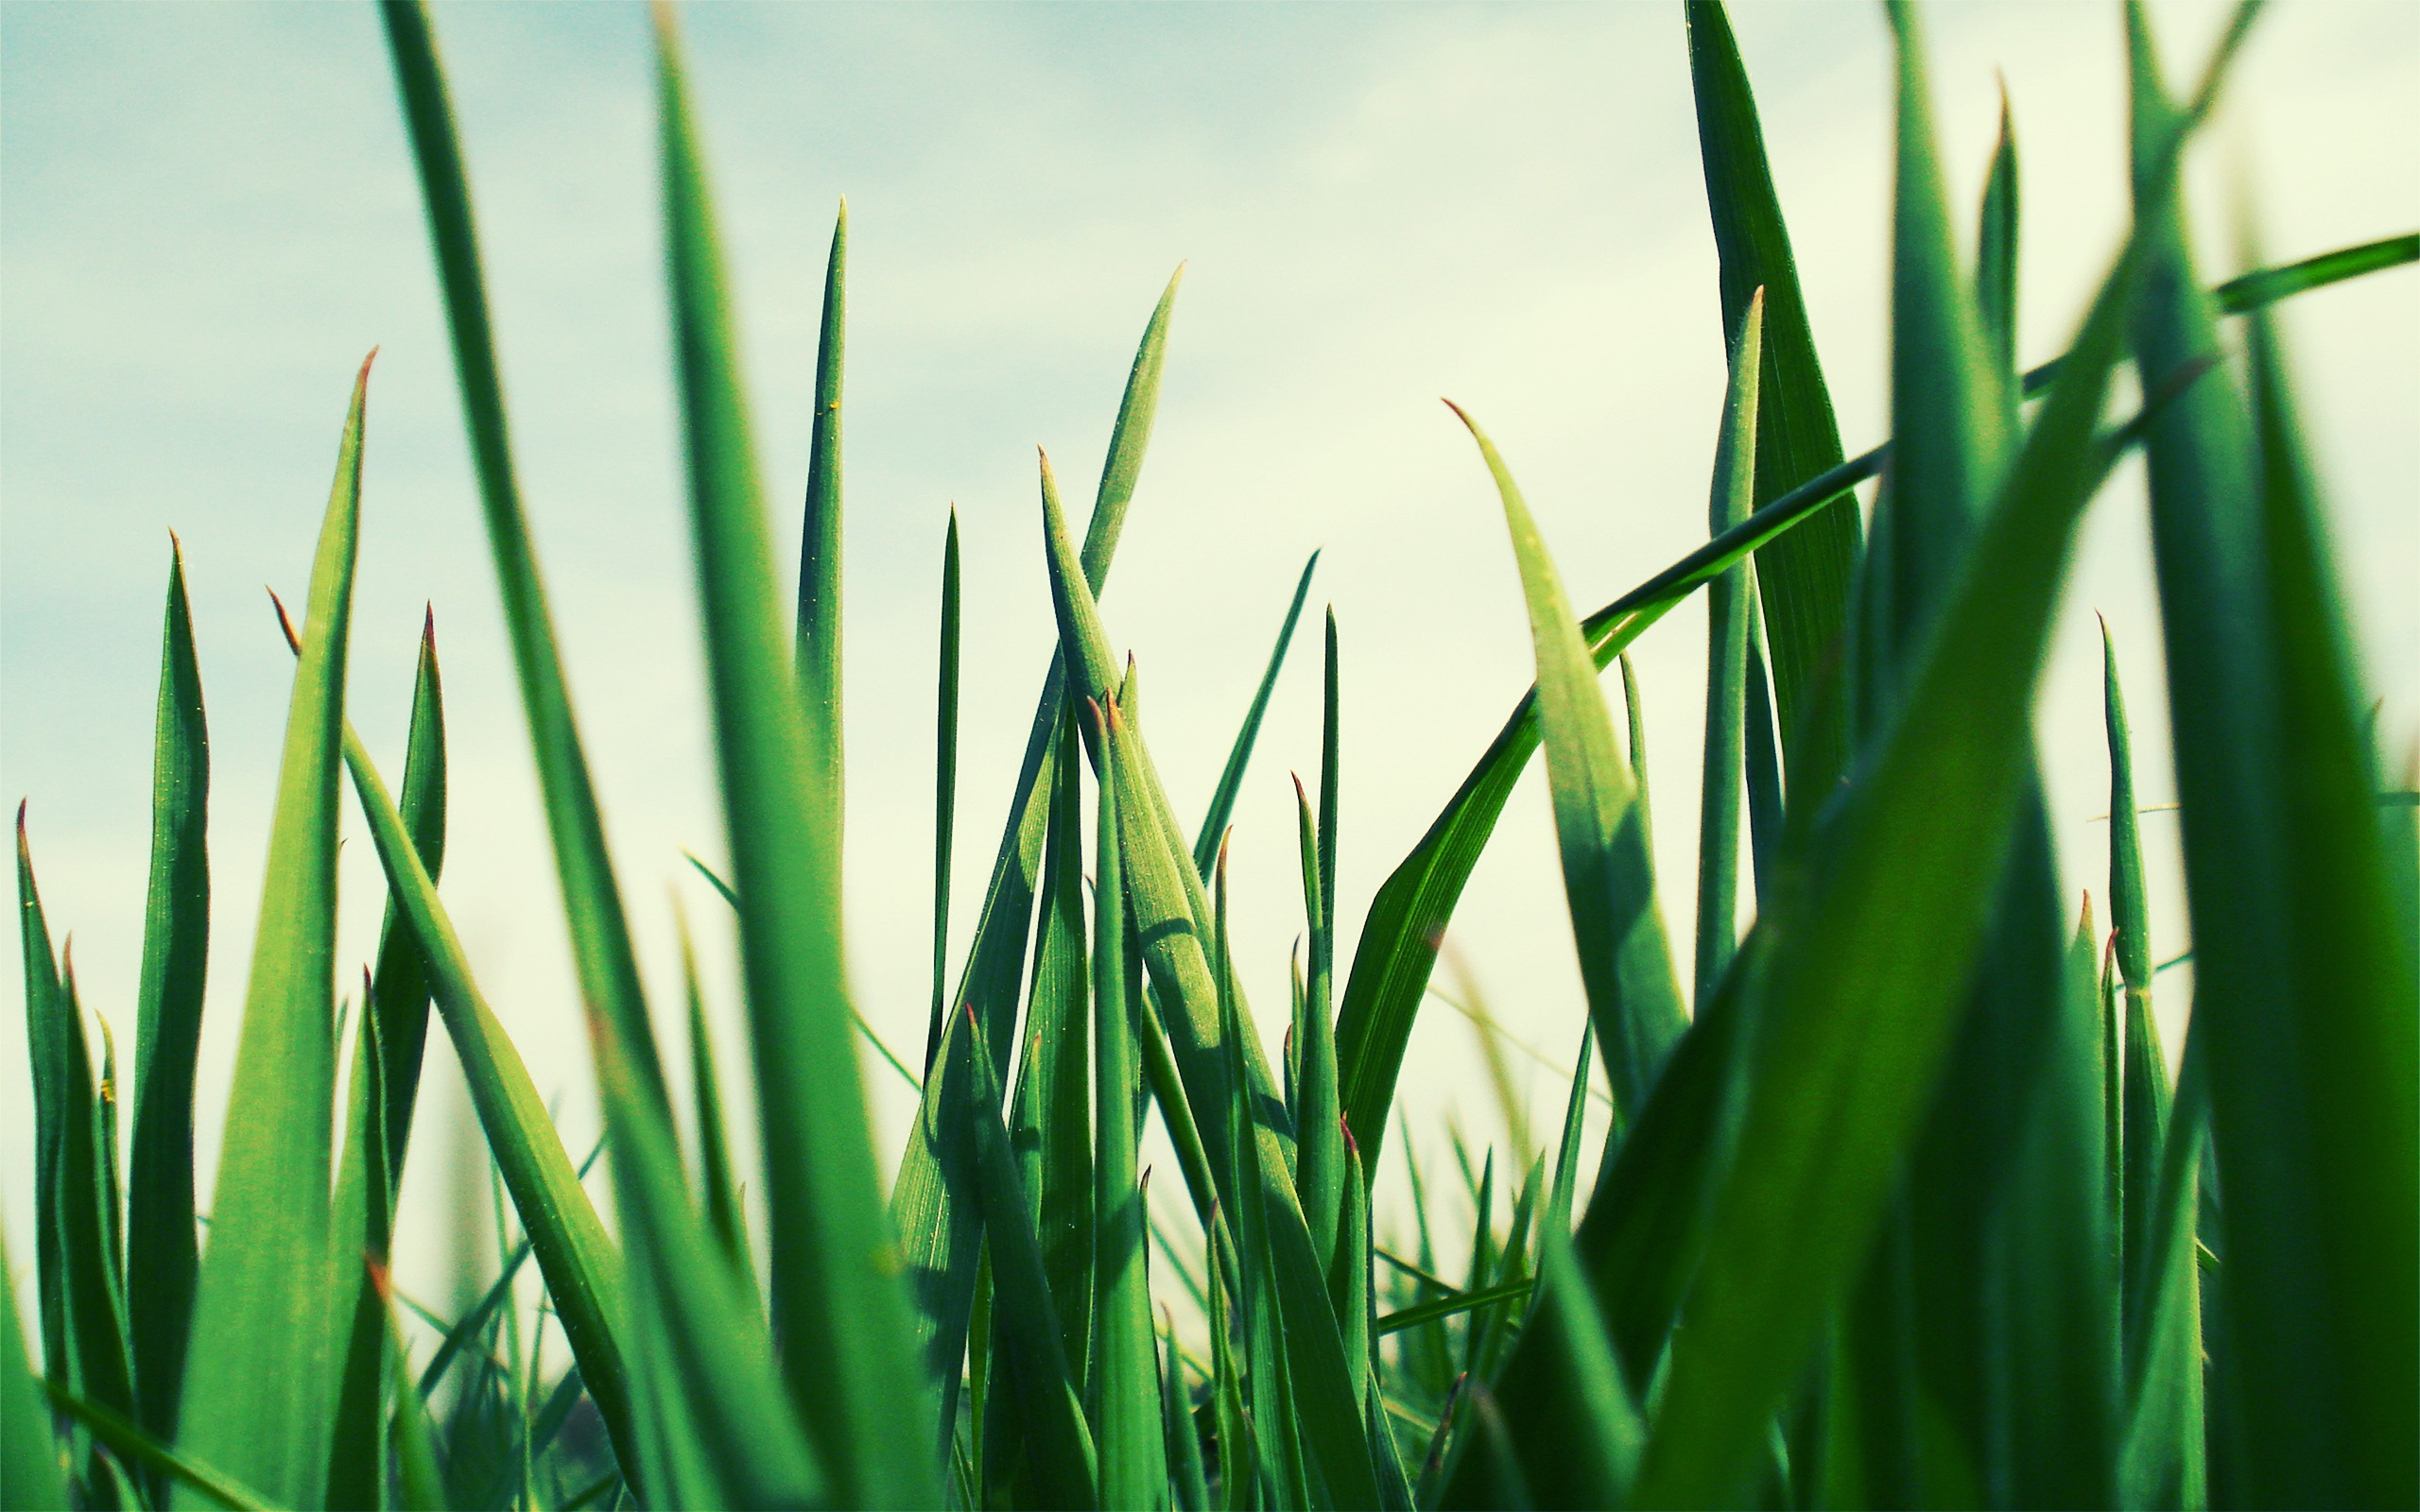 terraria how to get blade of grass